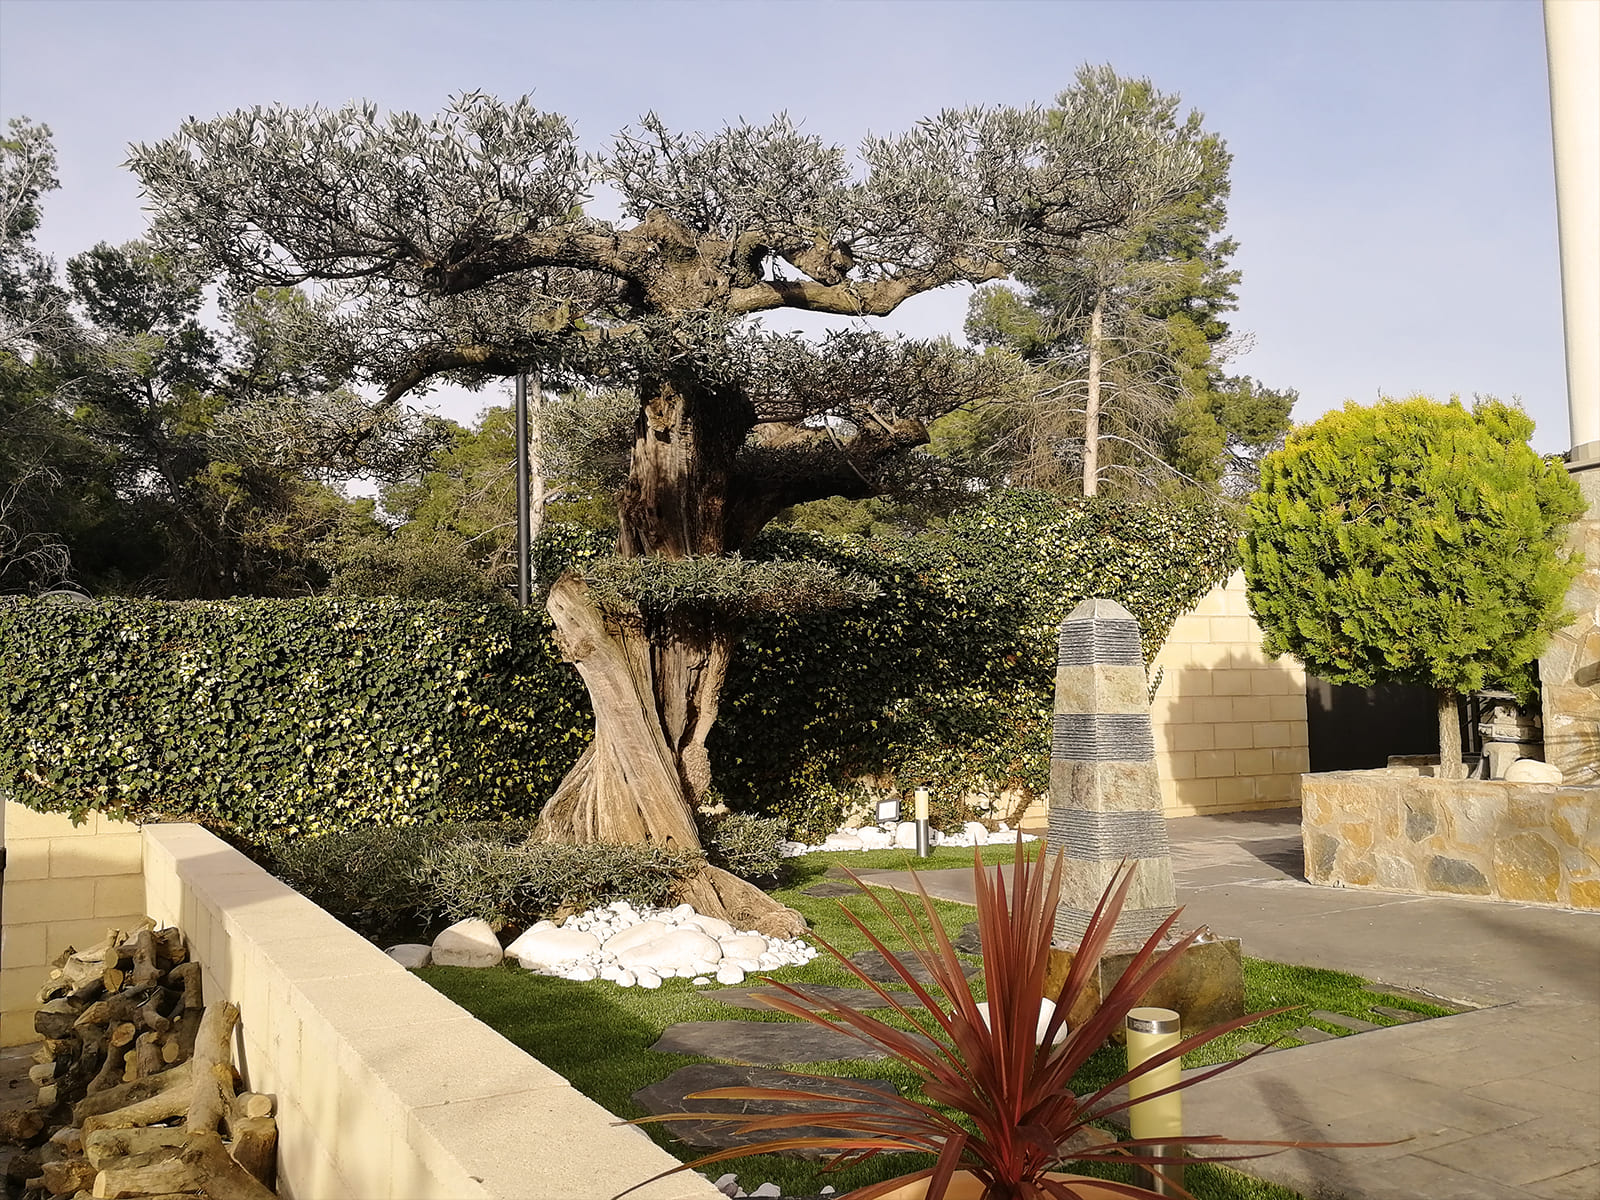 diseño-jardines-espacio-olivo-MM-05_HIDROJARDIN-Bañeres